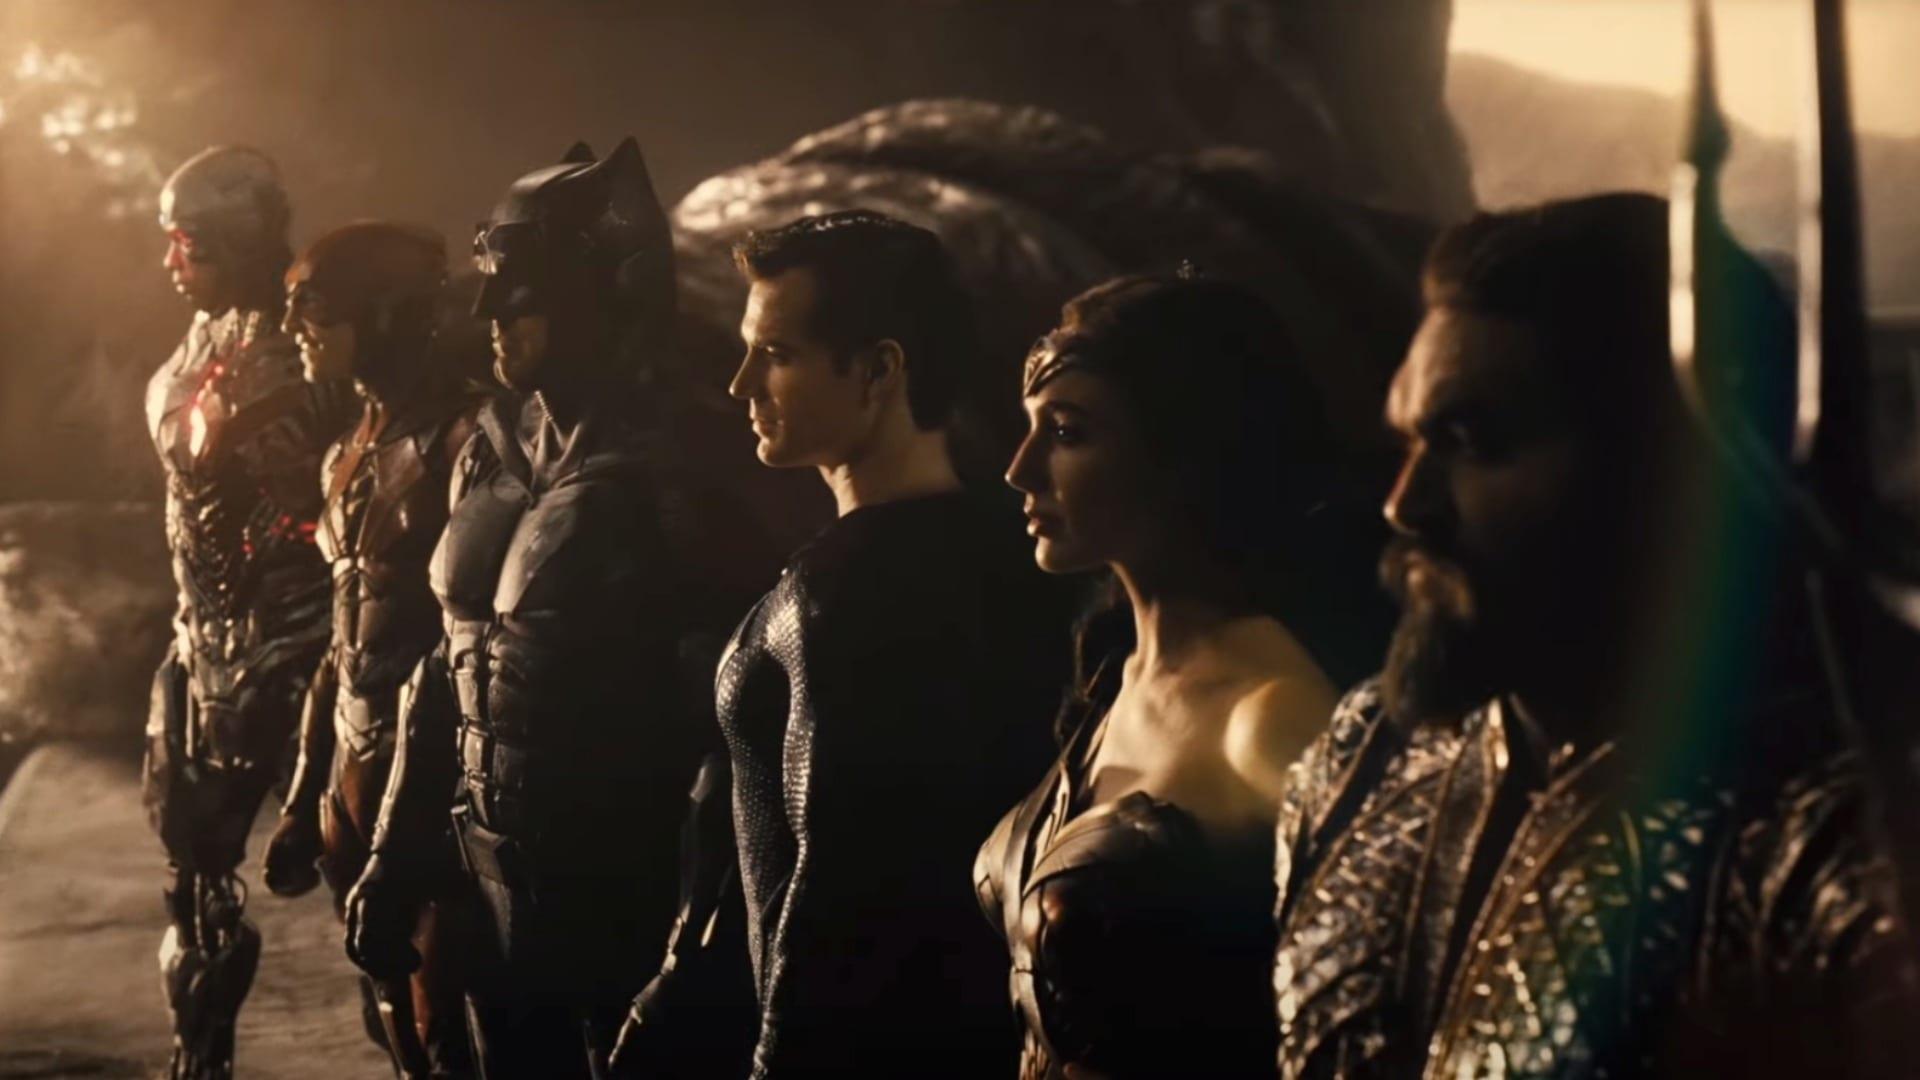 recensione di Zack Snyder's Justice League - heroes